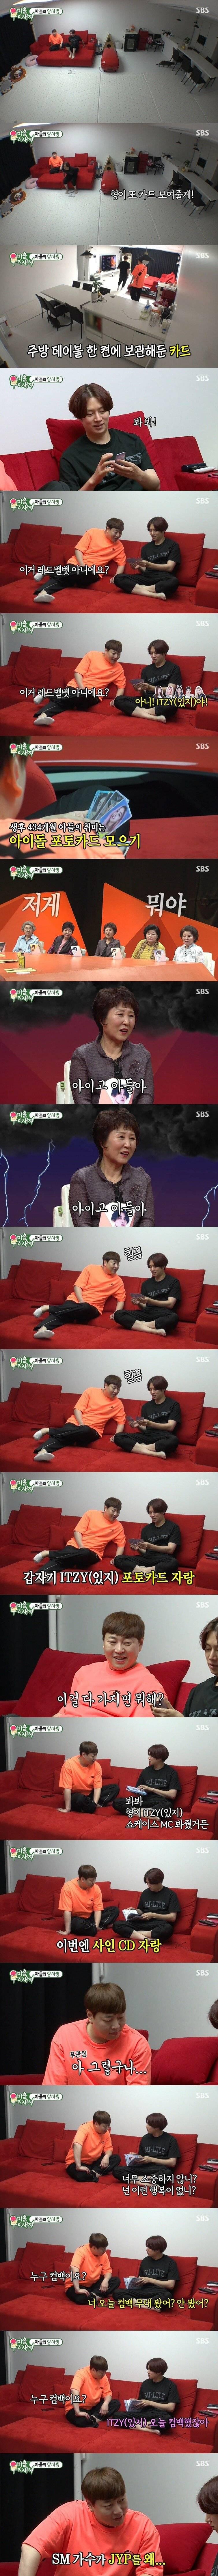 JYP 걸그룹 포카 모으는게 취미인 SM 아이돌 | 인스티즈